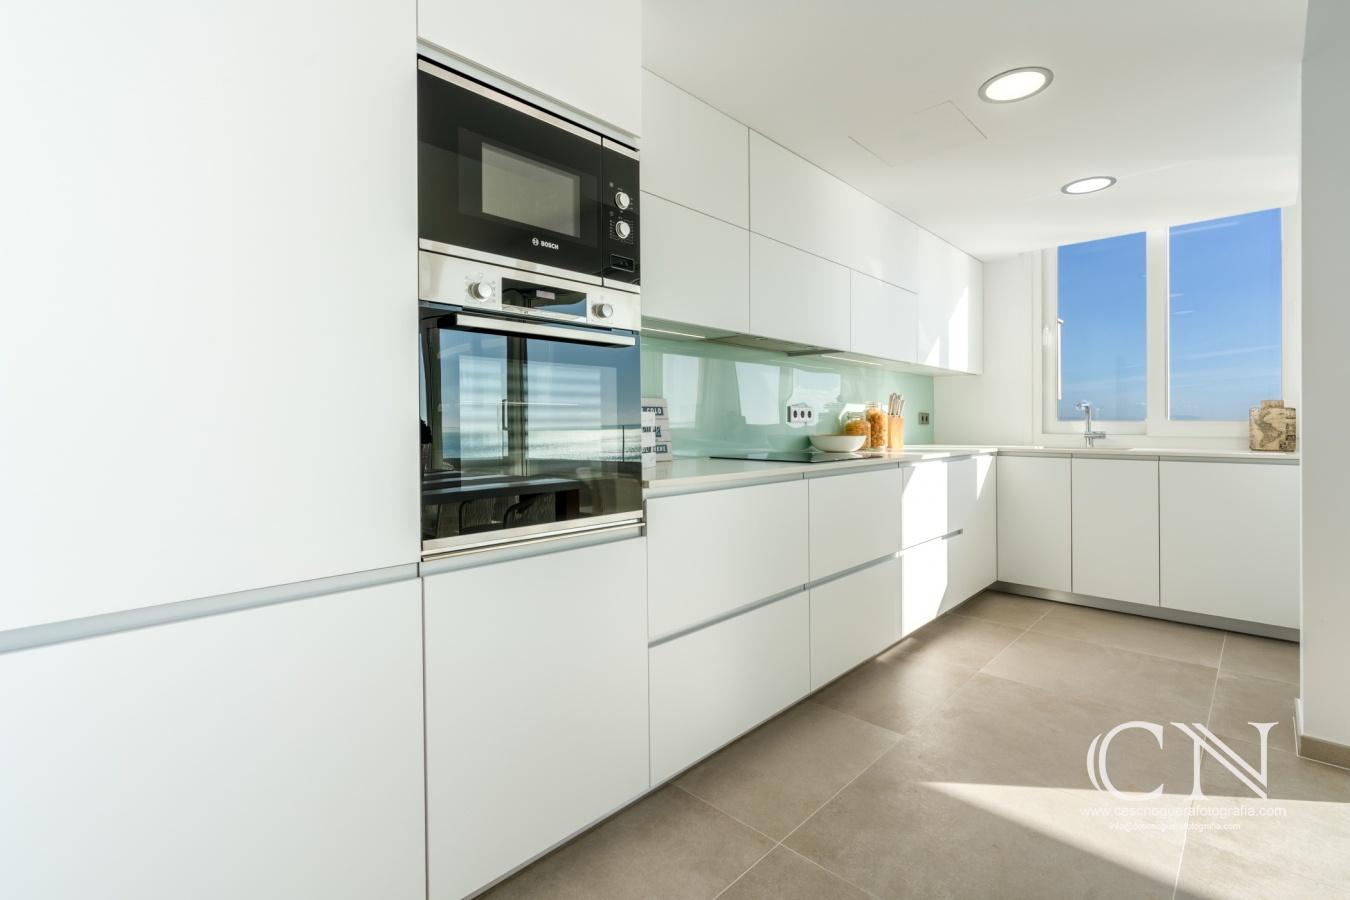 Apartament a Cala Vinyes - Cesc Noguera Fotografía, Architectural & Interior design photographer / Landscape Photography